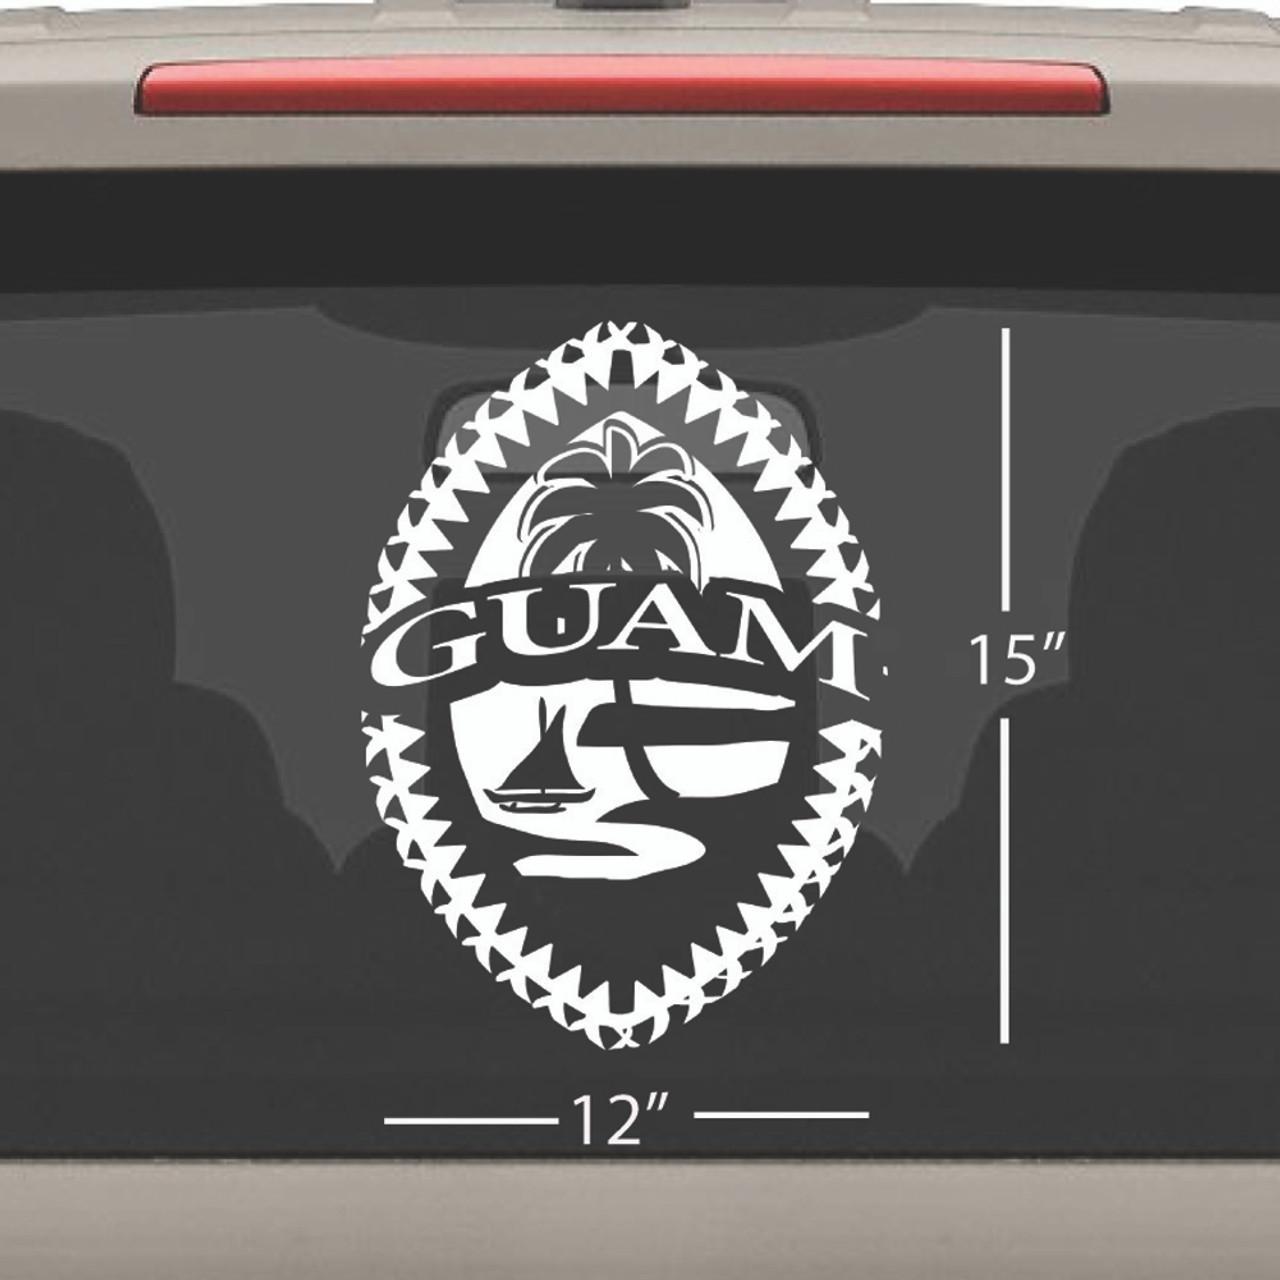 Mega Tribal Guam Seal Single Vinyl Decal 12x15 Inches